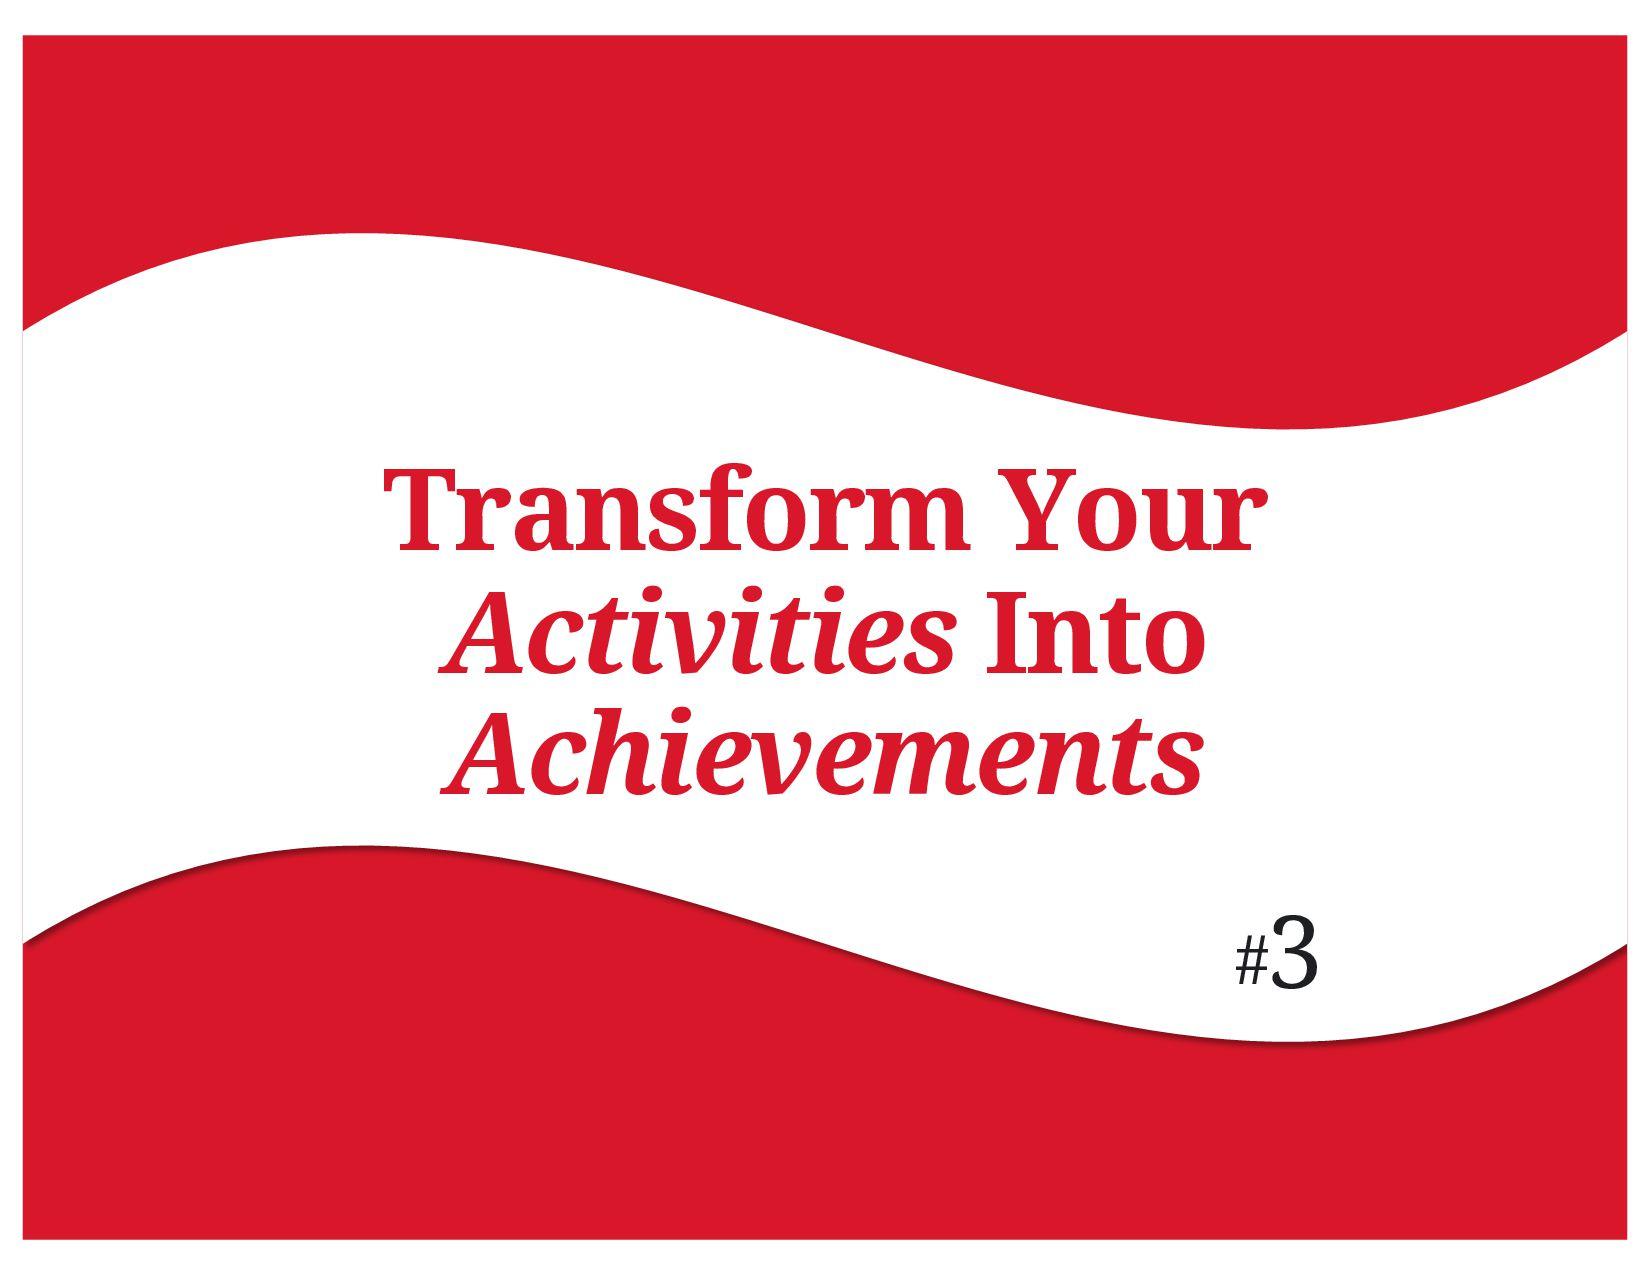 Transform Your Activities Into Achievements 3 #